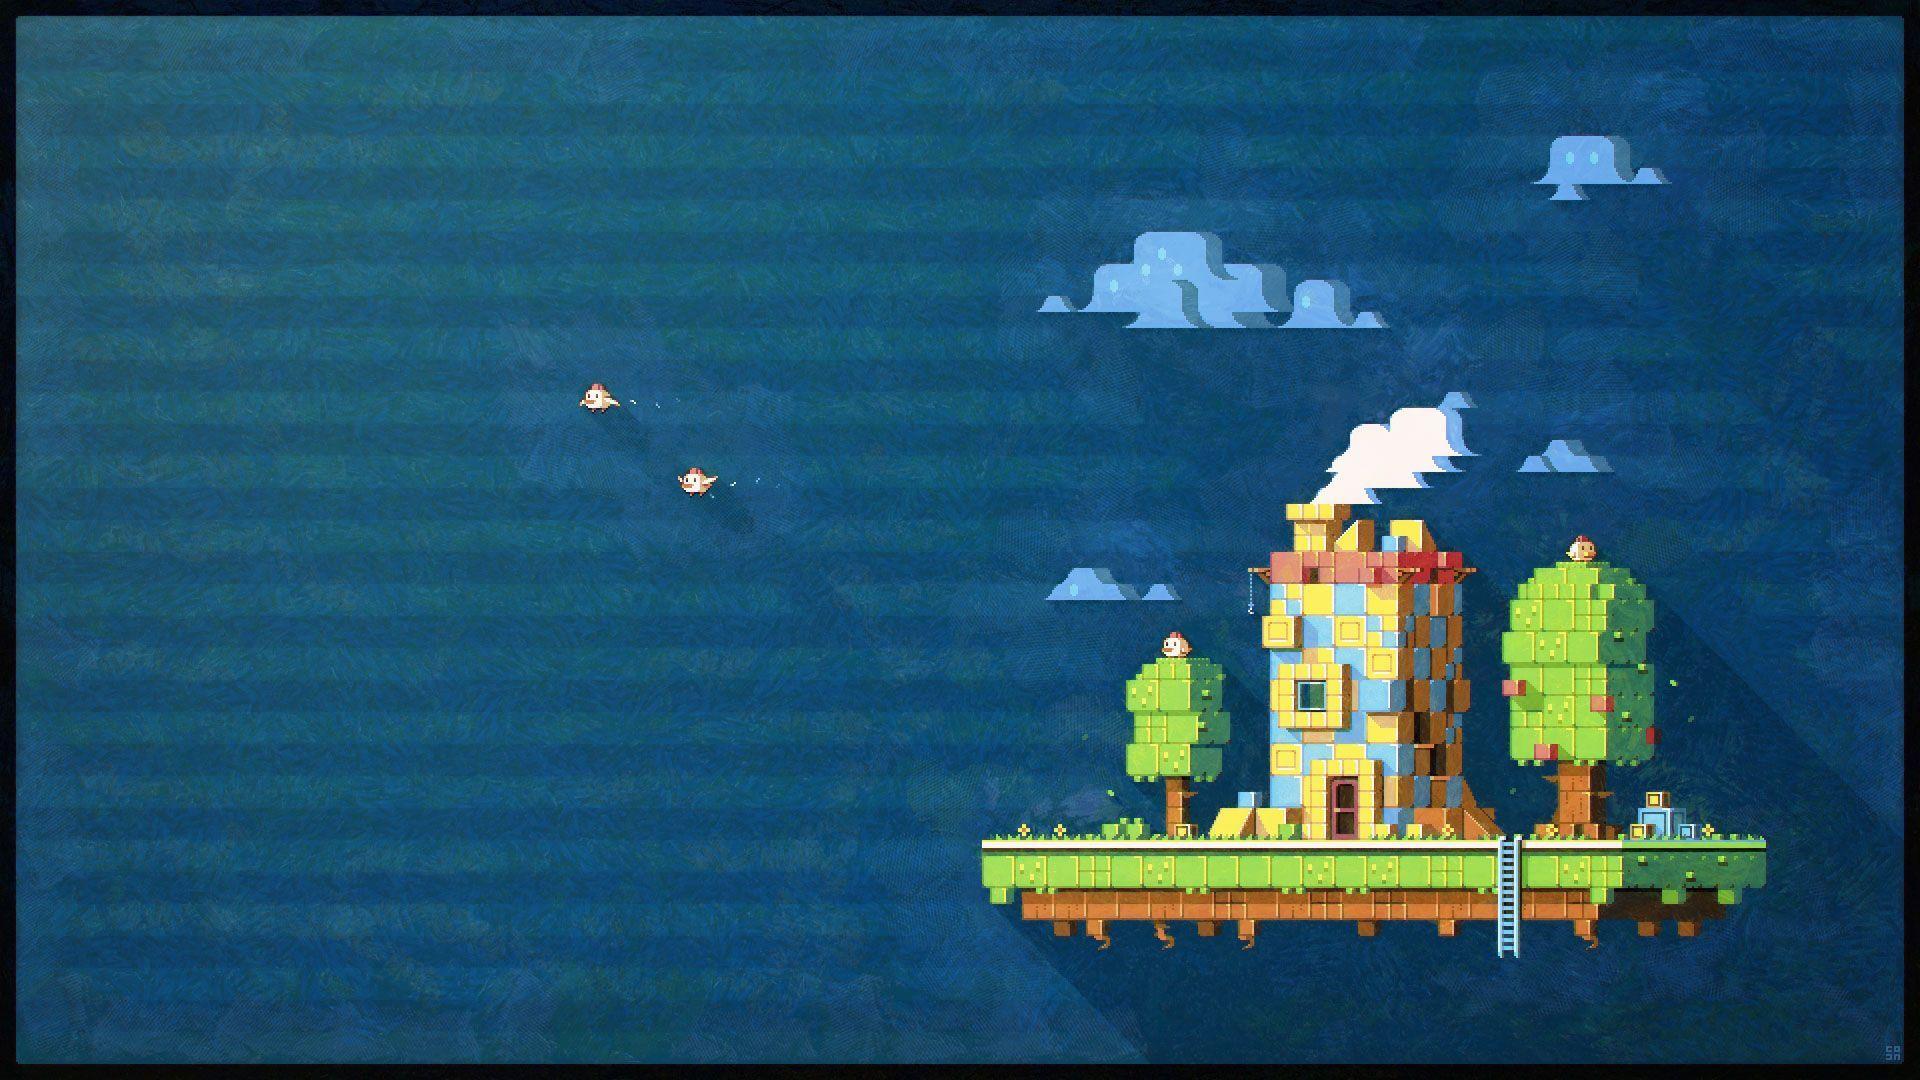 1080p Animated Pixel Art Wallpaper In 2020 Pixel Art Pixel Art Background Pixel Art Landscape